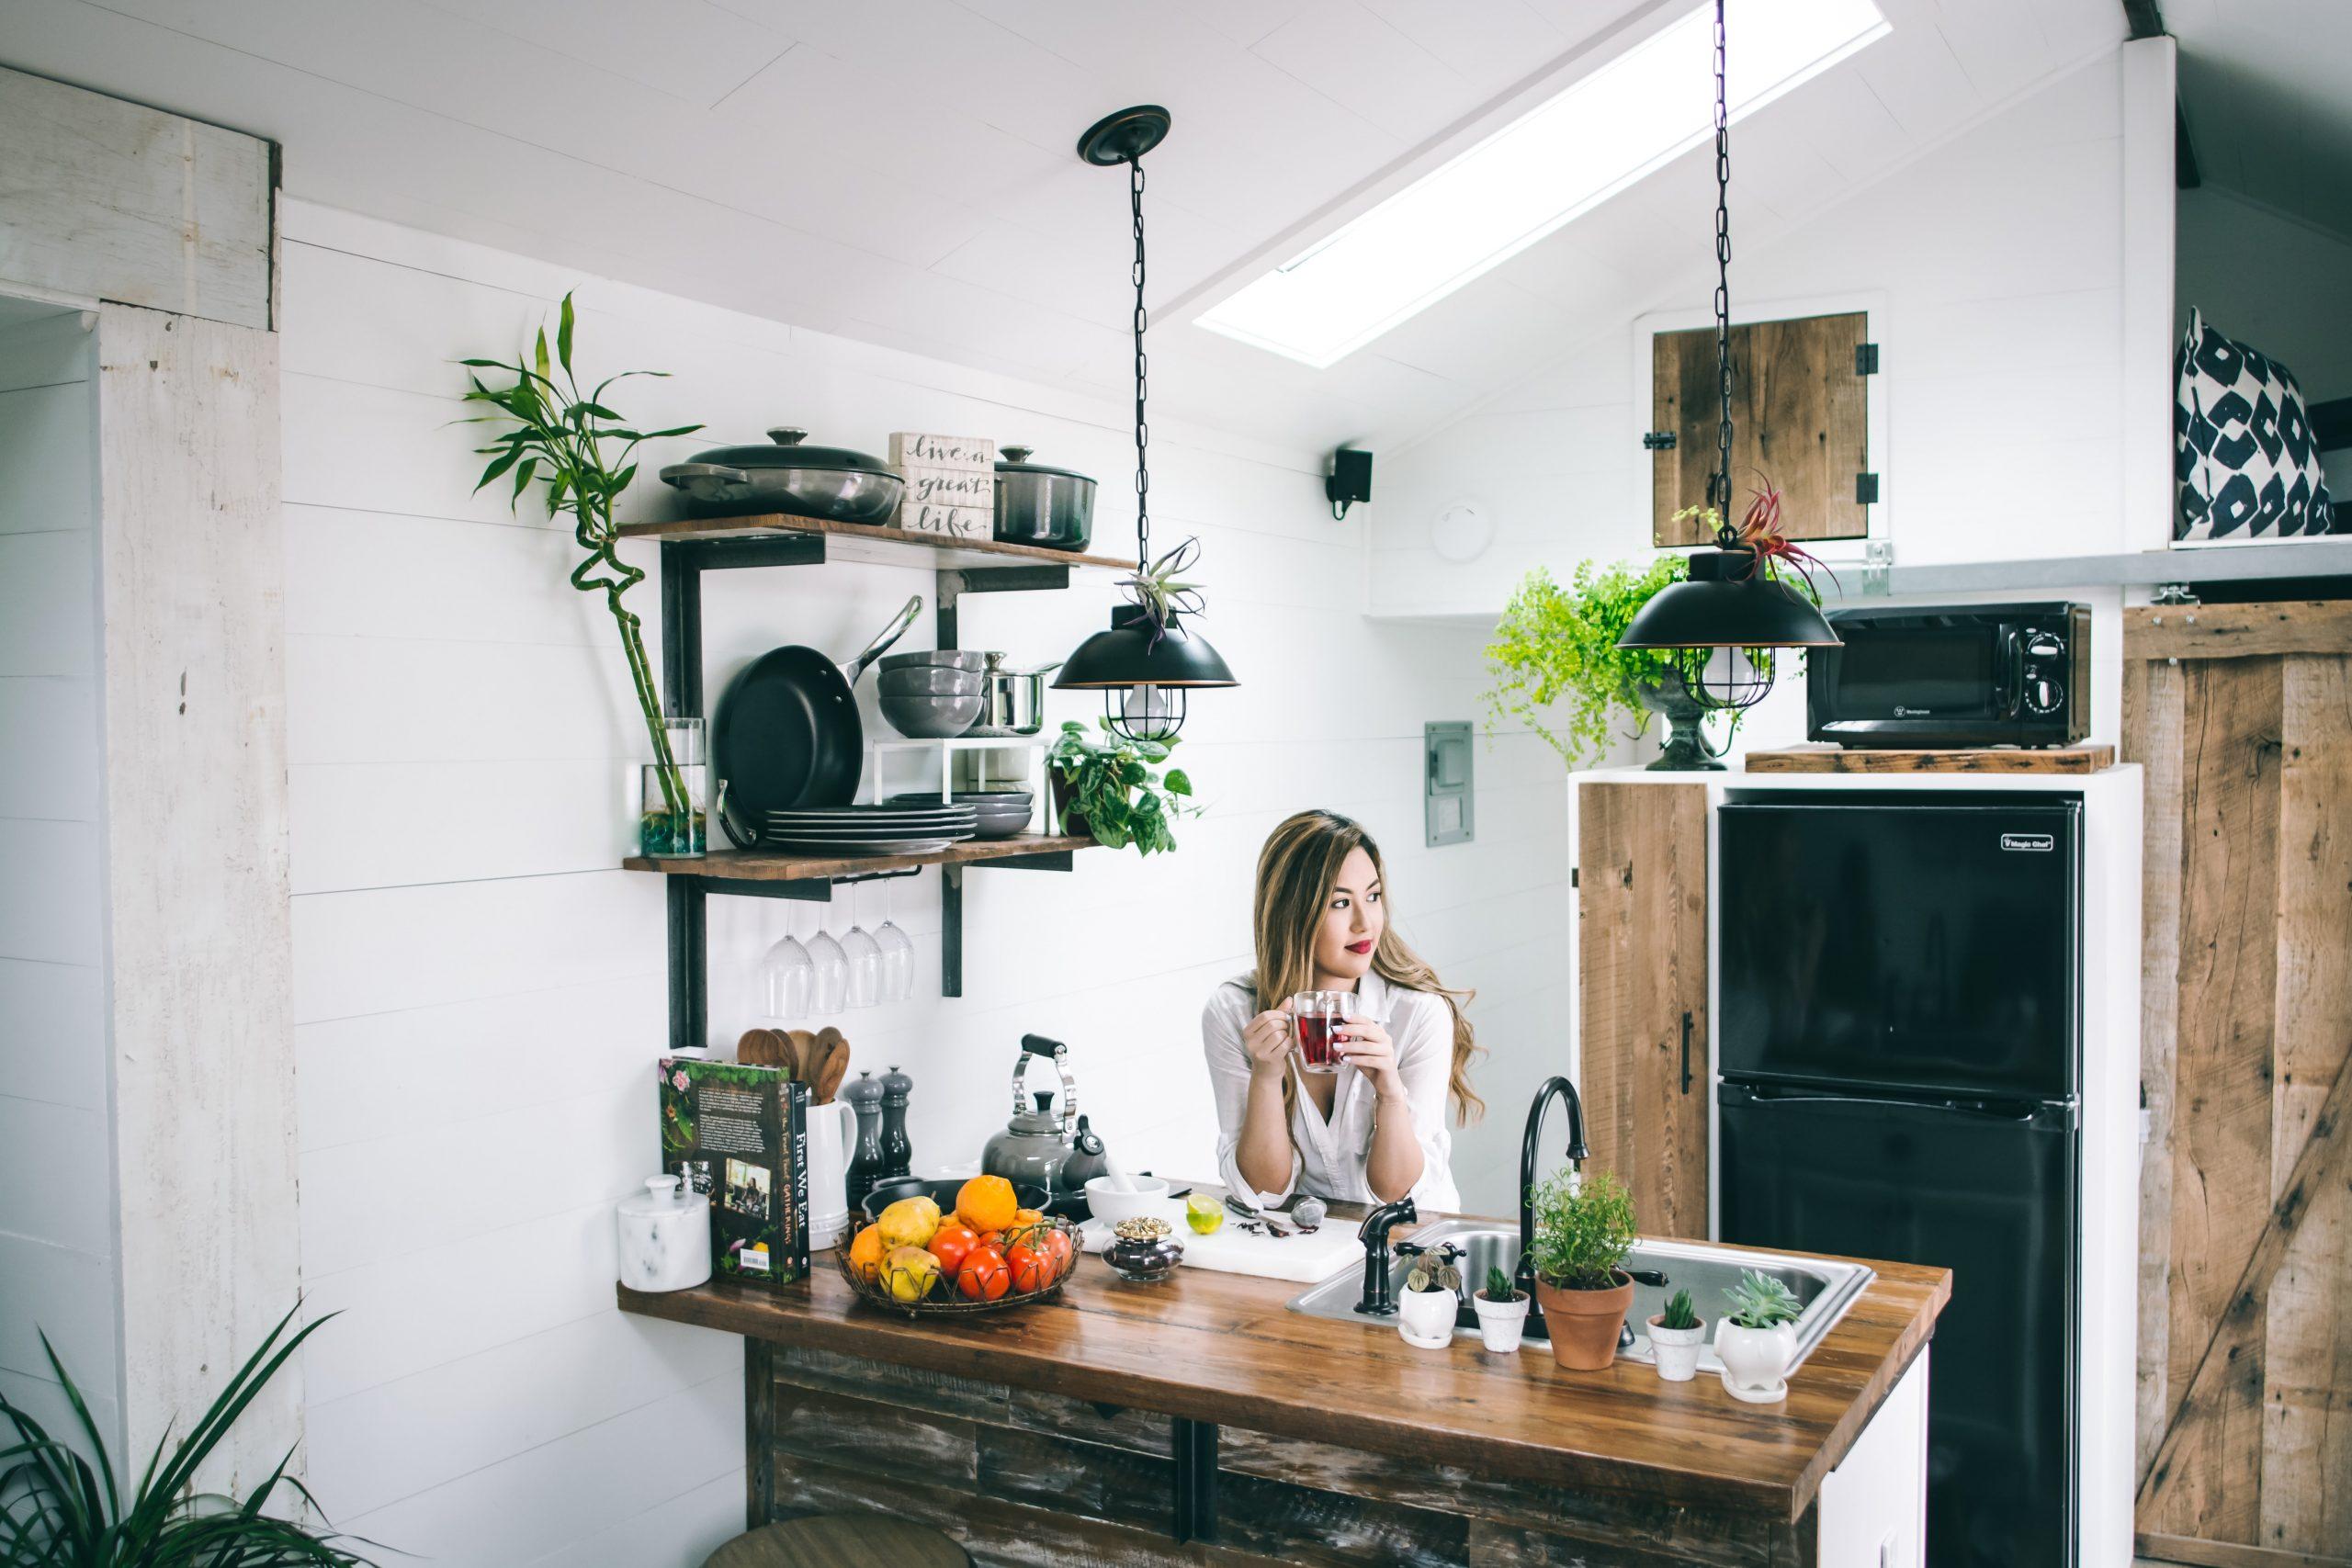 Woman sitting kitchen lights plants wooden